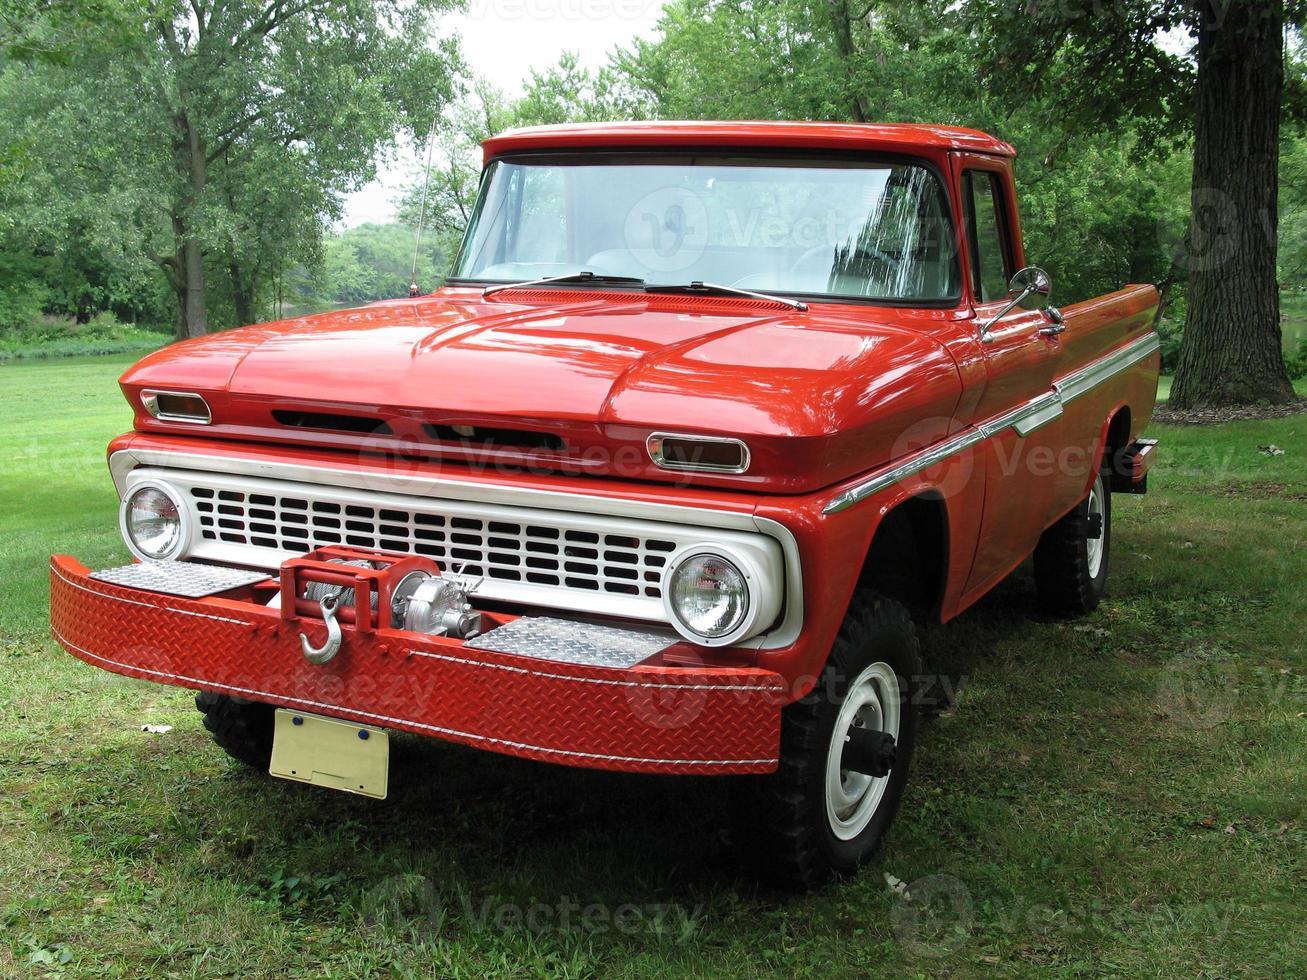 grande camioncino rosso foto